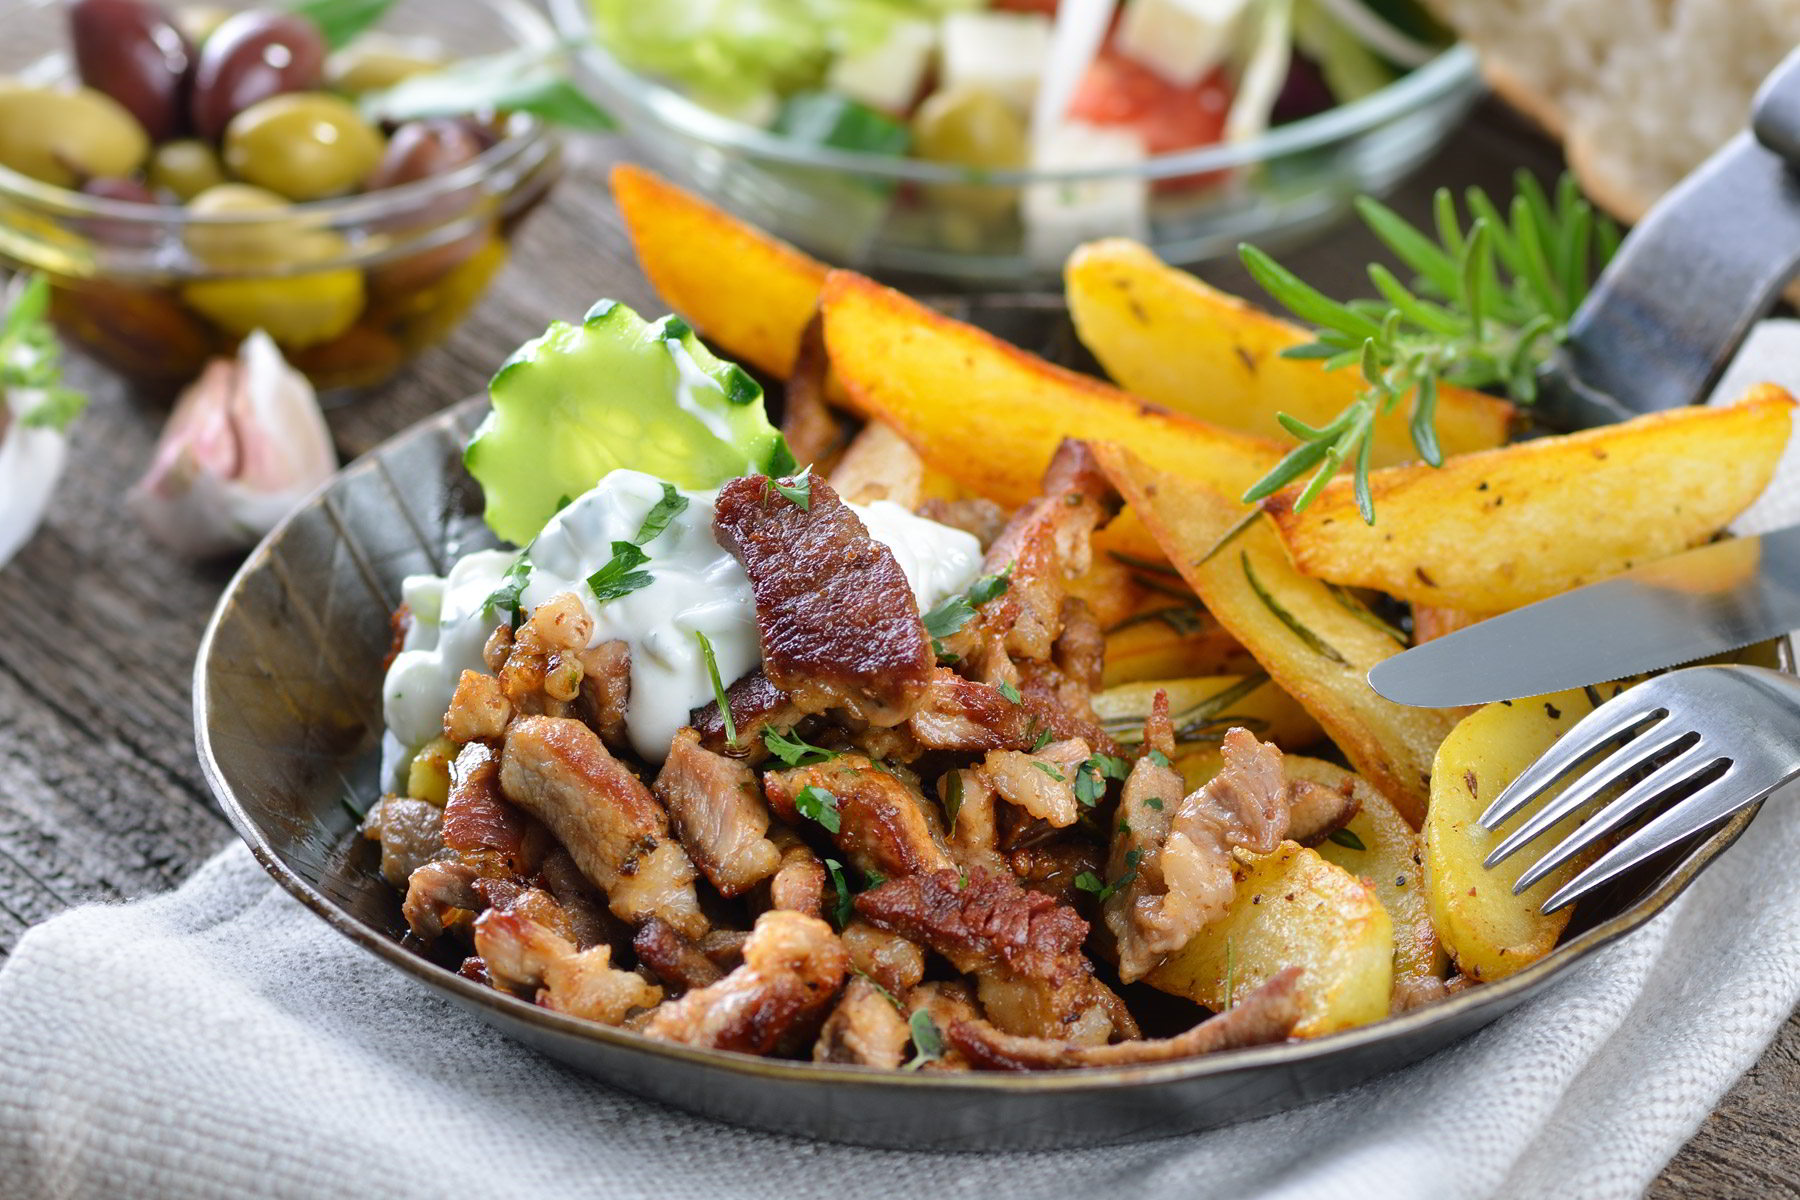 greek-pork-gyros-with-fried-potatoes-and-sauce.jpg